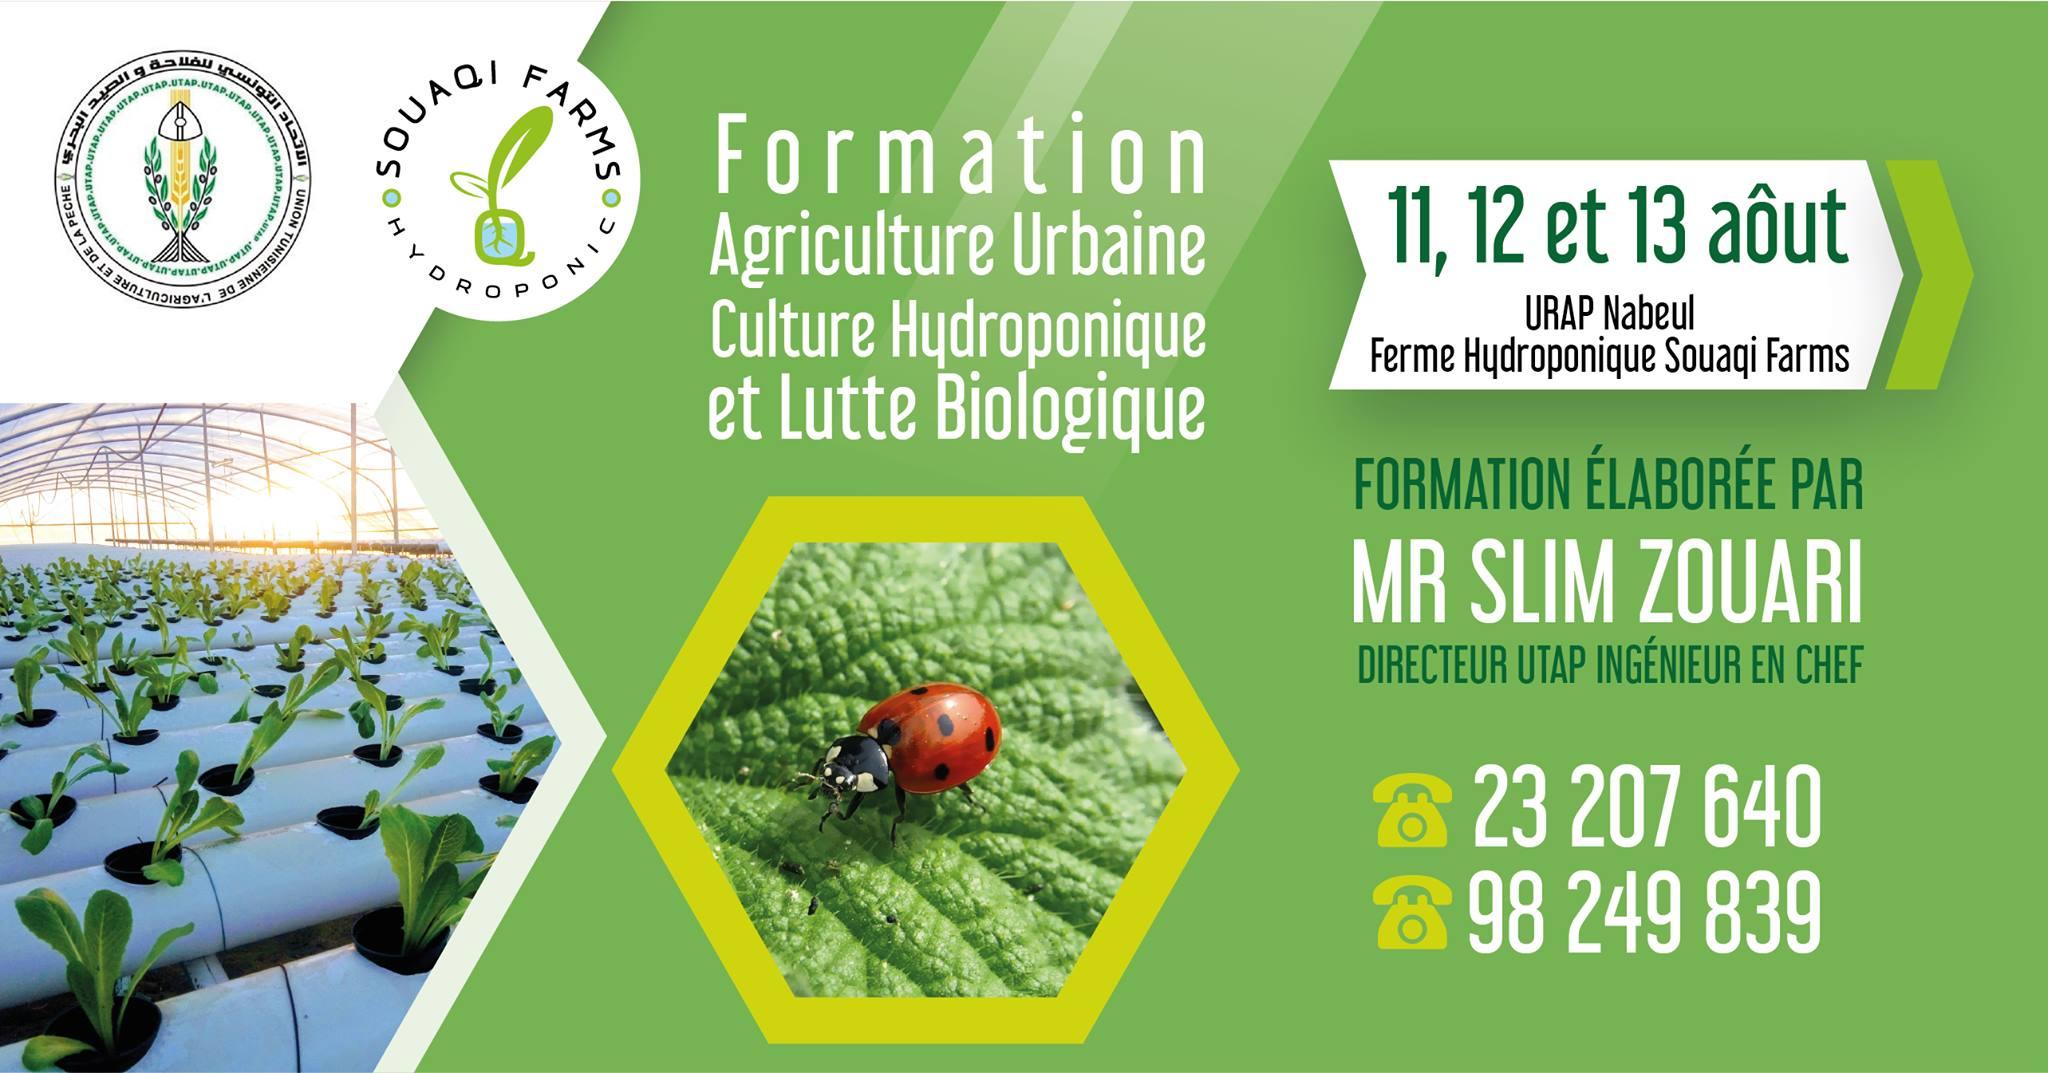 Agriculture Urbaine ,Culture Hydroponique & Lutte Biologique الإتحاد الجهوي للفلاحة والصيد البحري بولاية نابل